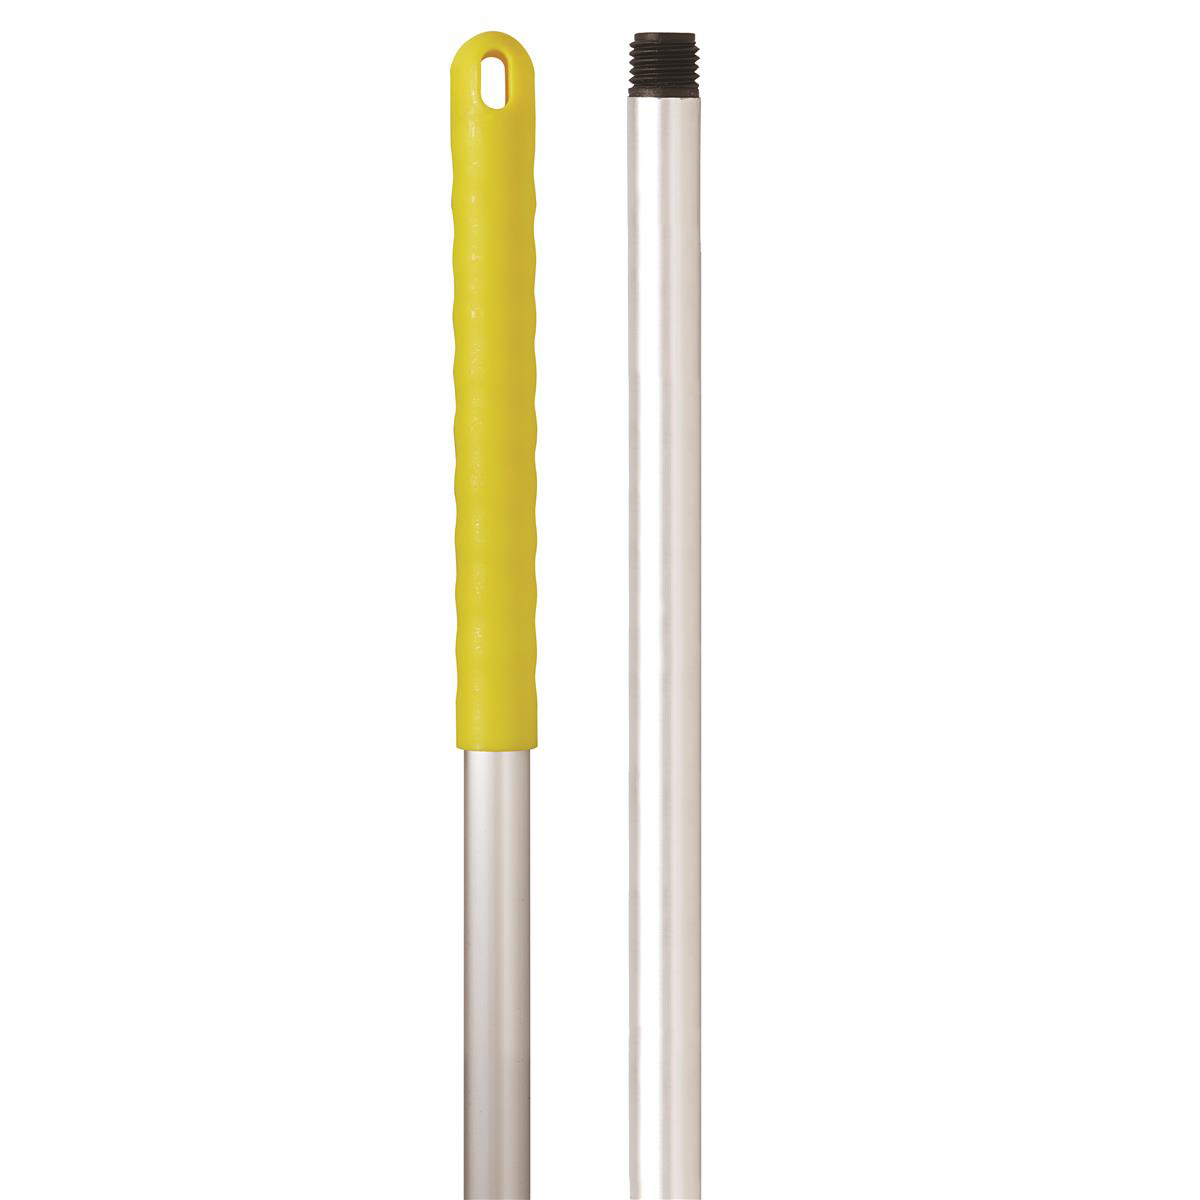 Robert Scott & Sons Abbey Hygiene Mop Handle Aluminium Colour-coded Screw 137cm Yellow Ref 103131YELLOW